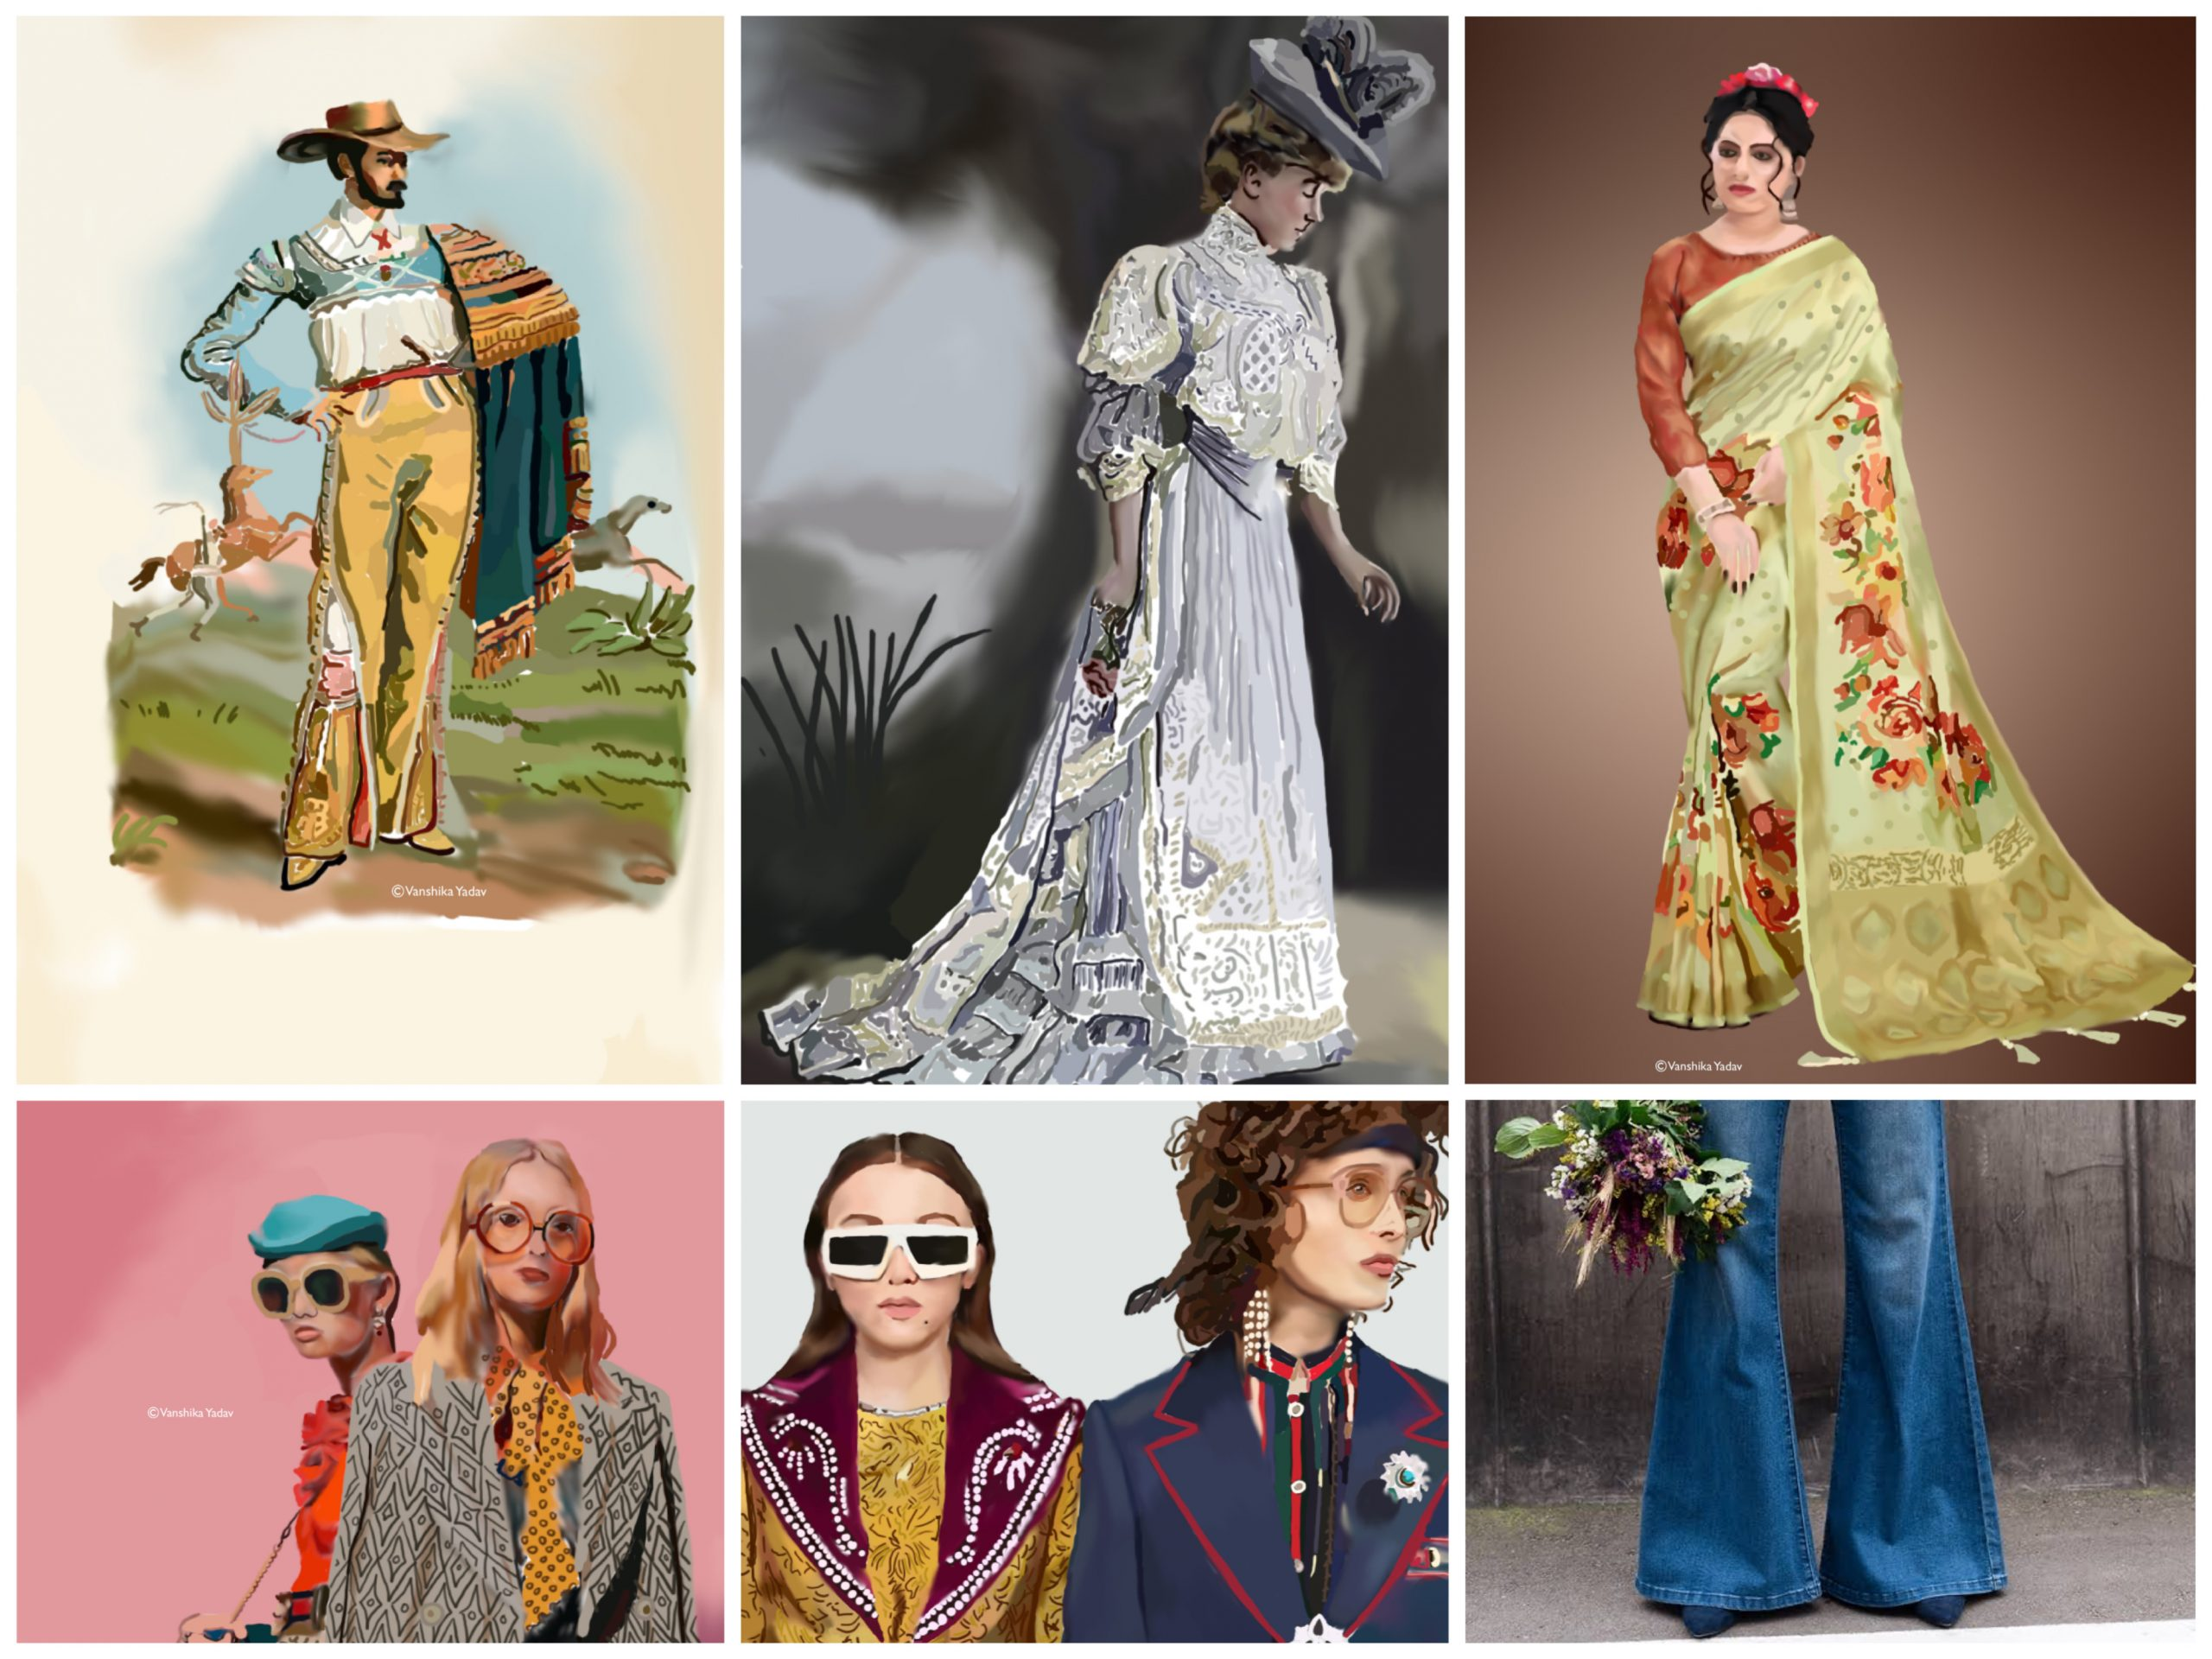 Fashion and Identity